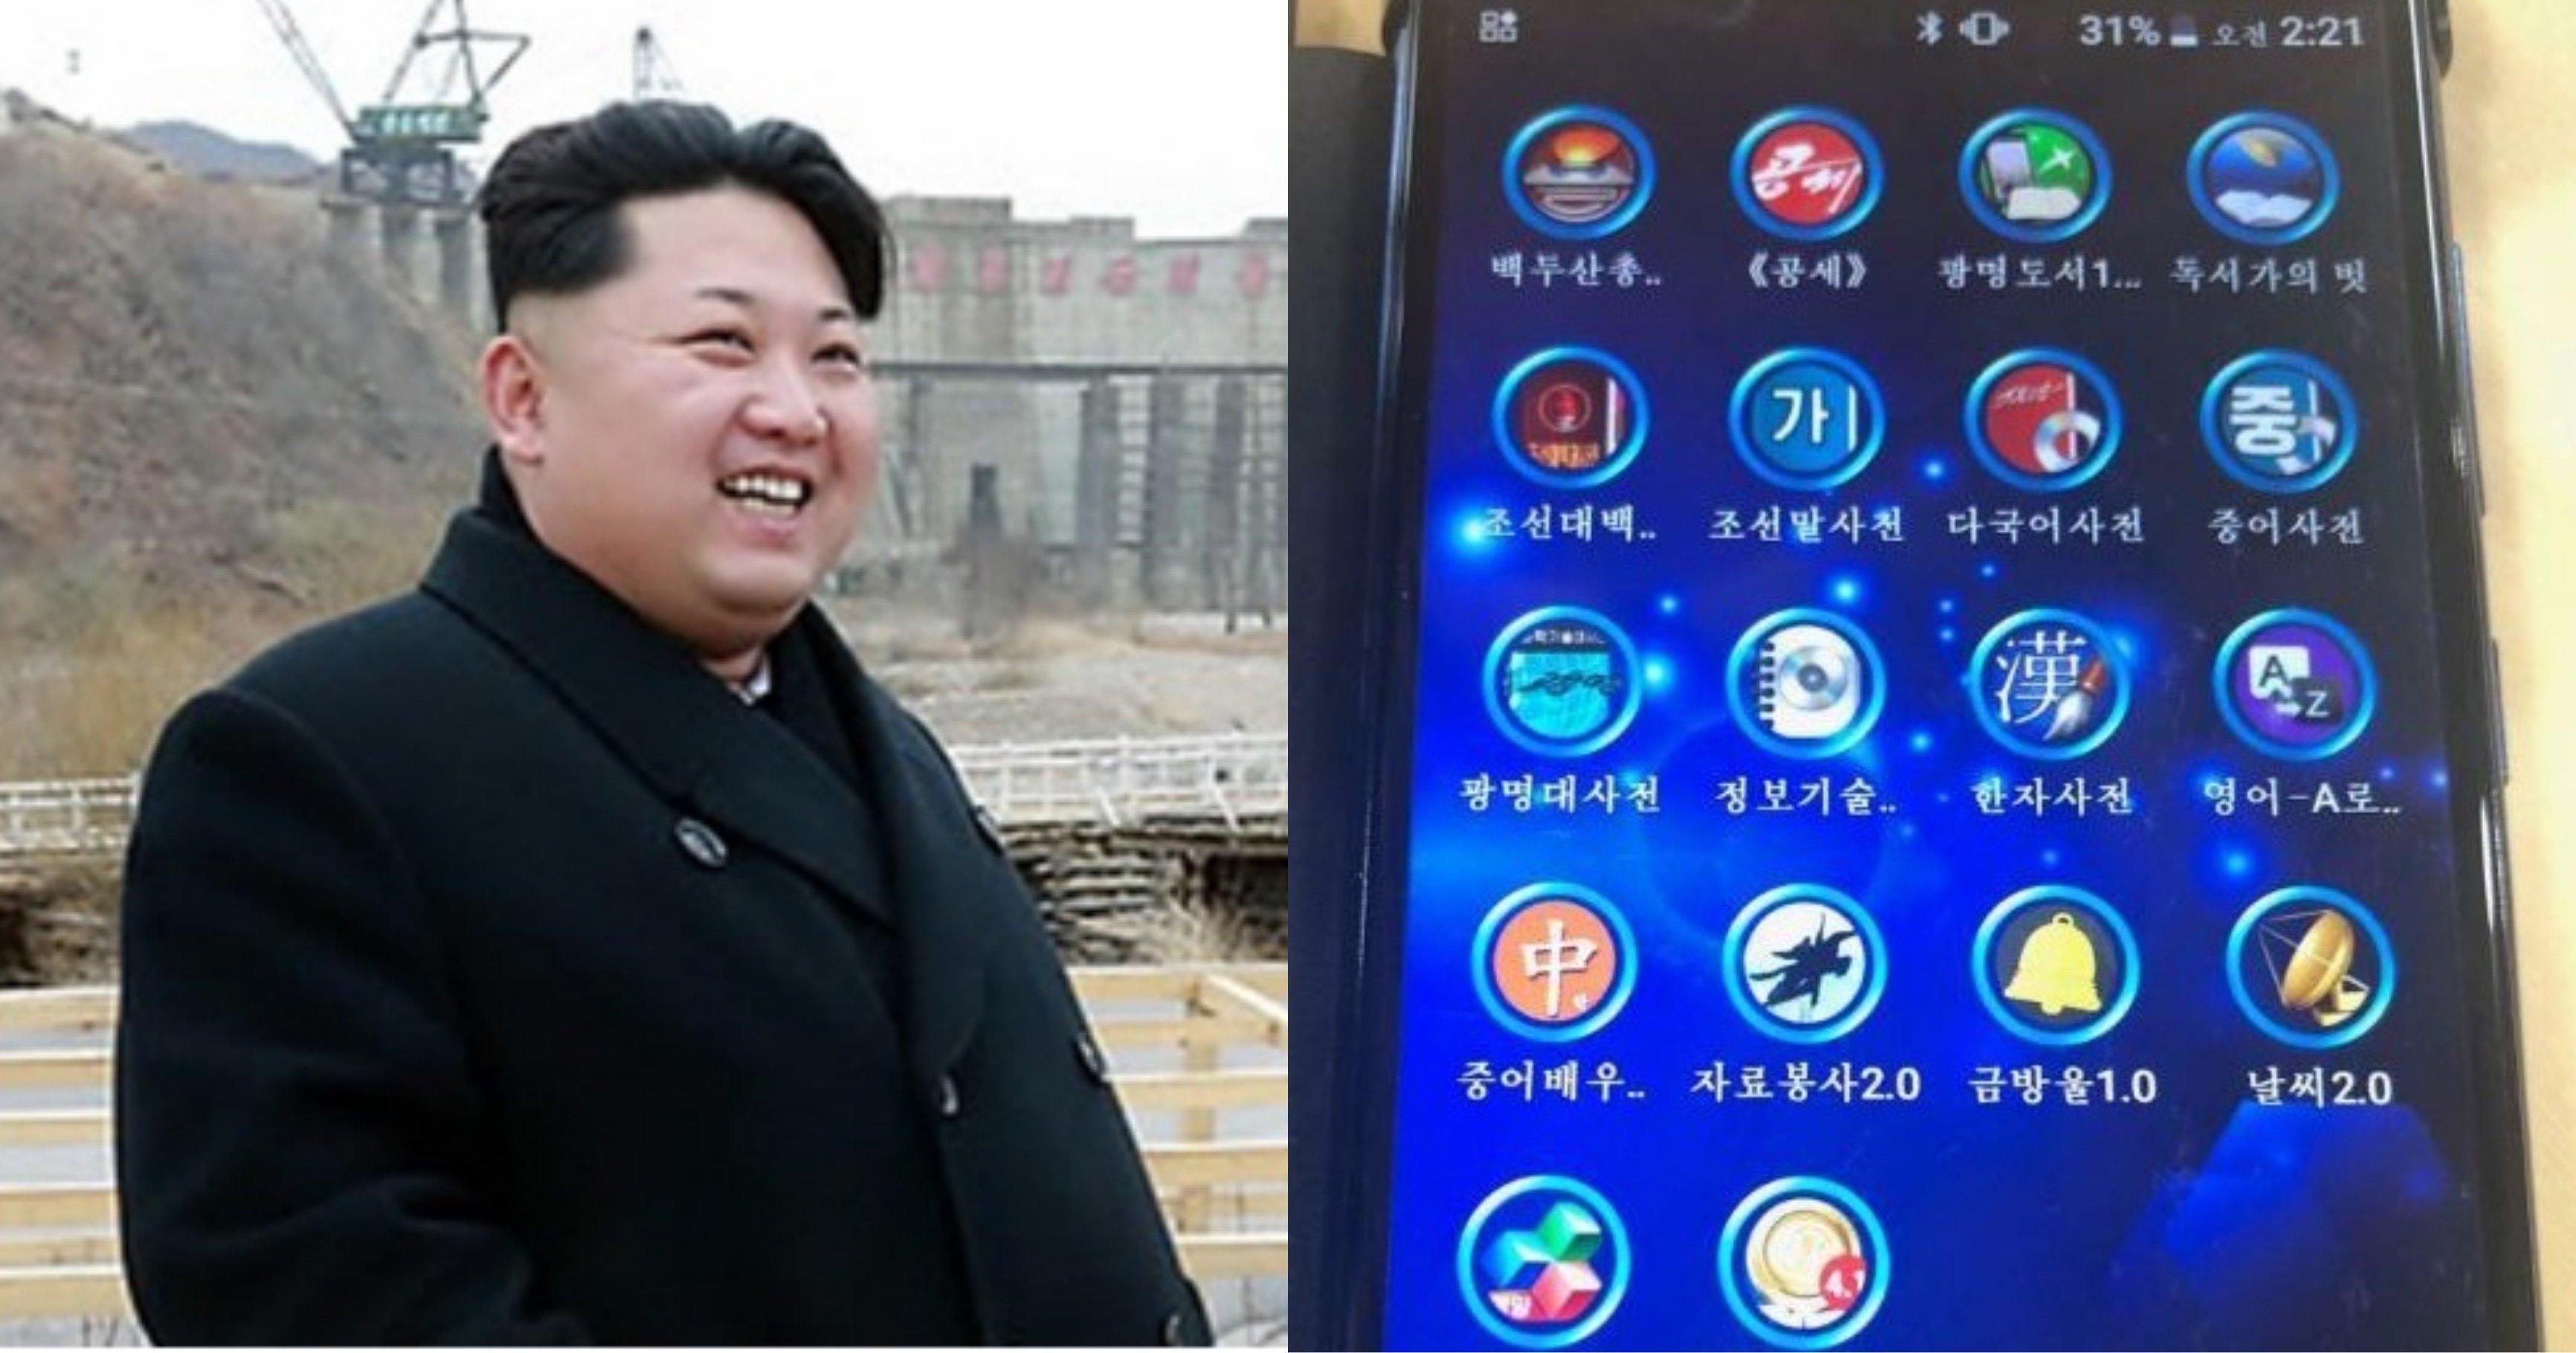 "kakaotalk 20210901 171625183.jpg?resize=1200,630 - ""장난아닌데?"" 북한에서 직접 만든 스마트폰 '평양'의 성능"